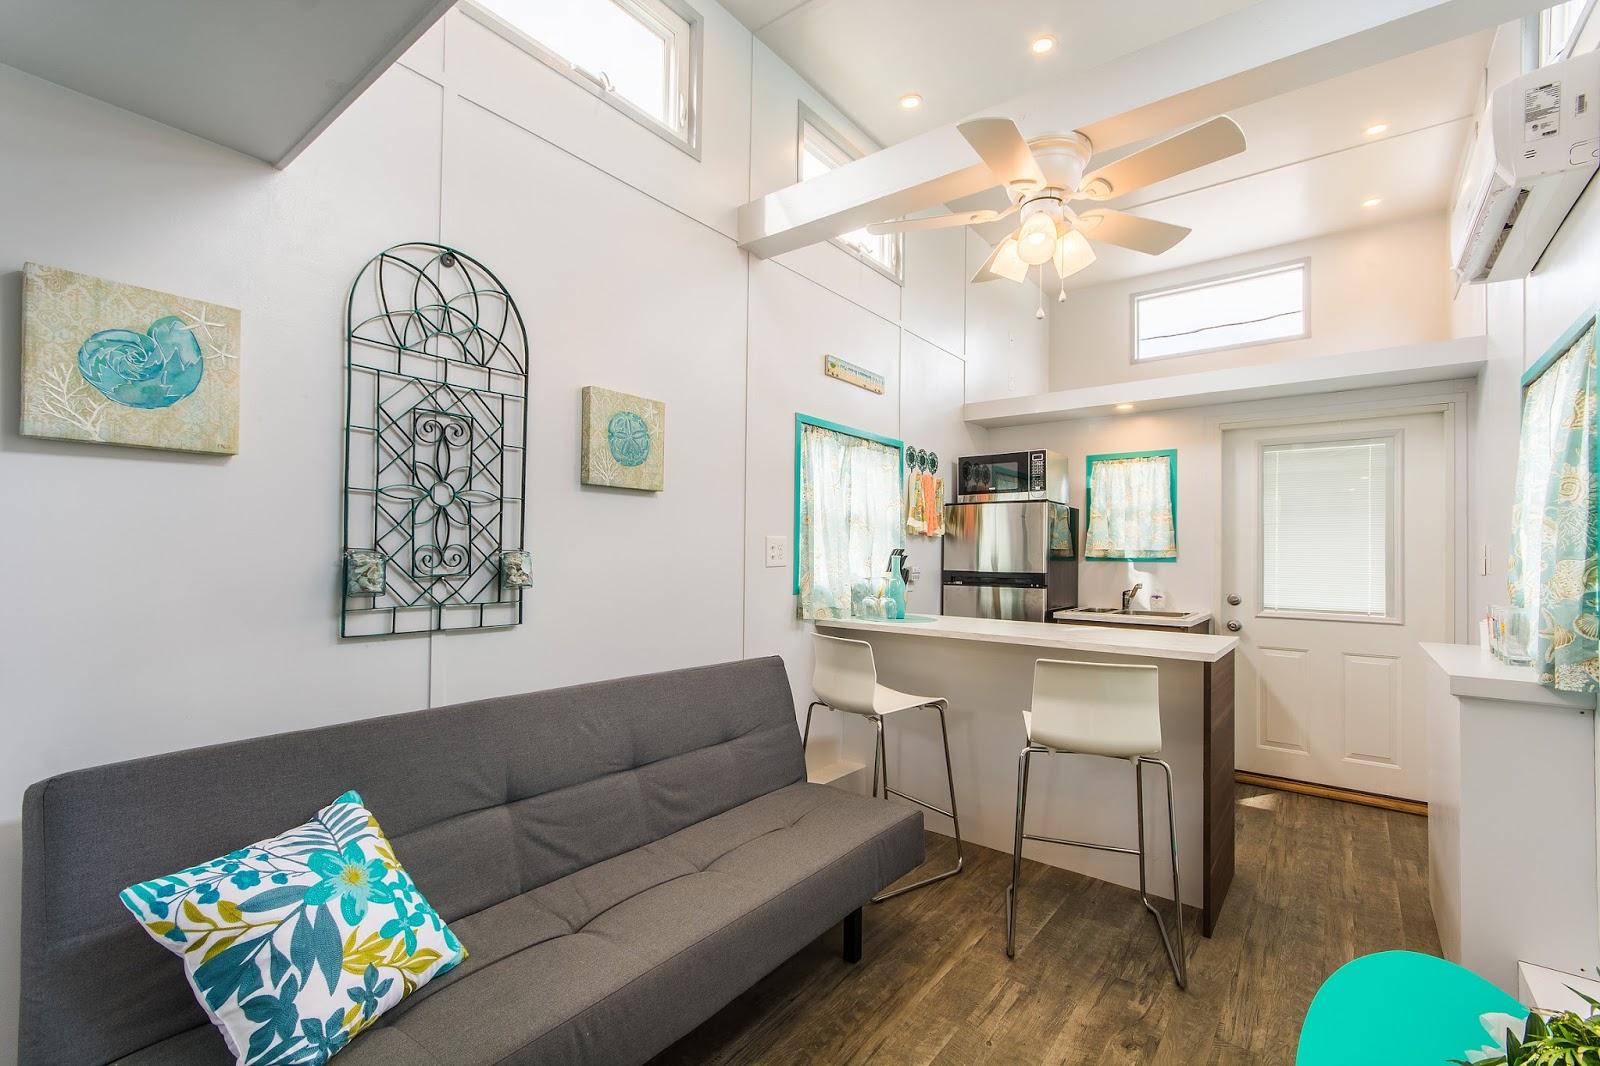 TINY HOUSE TOWN: The Sand Dollar at Tiny House Siesta